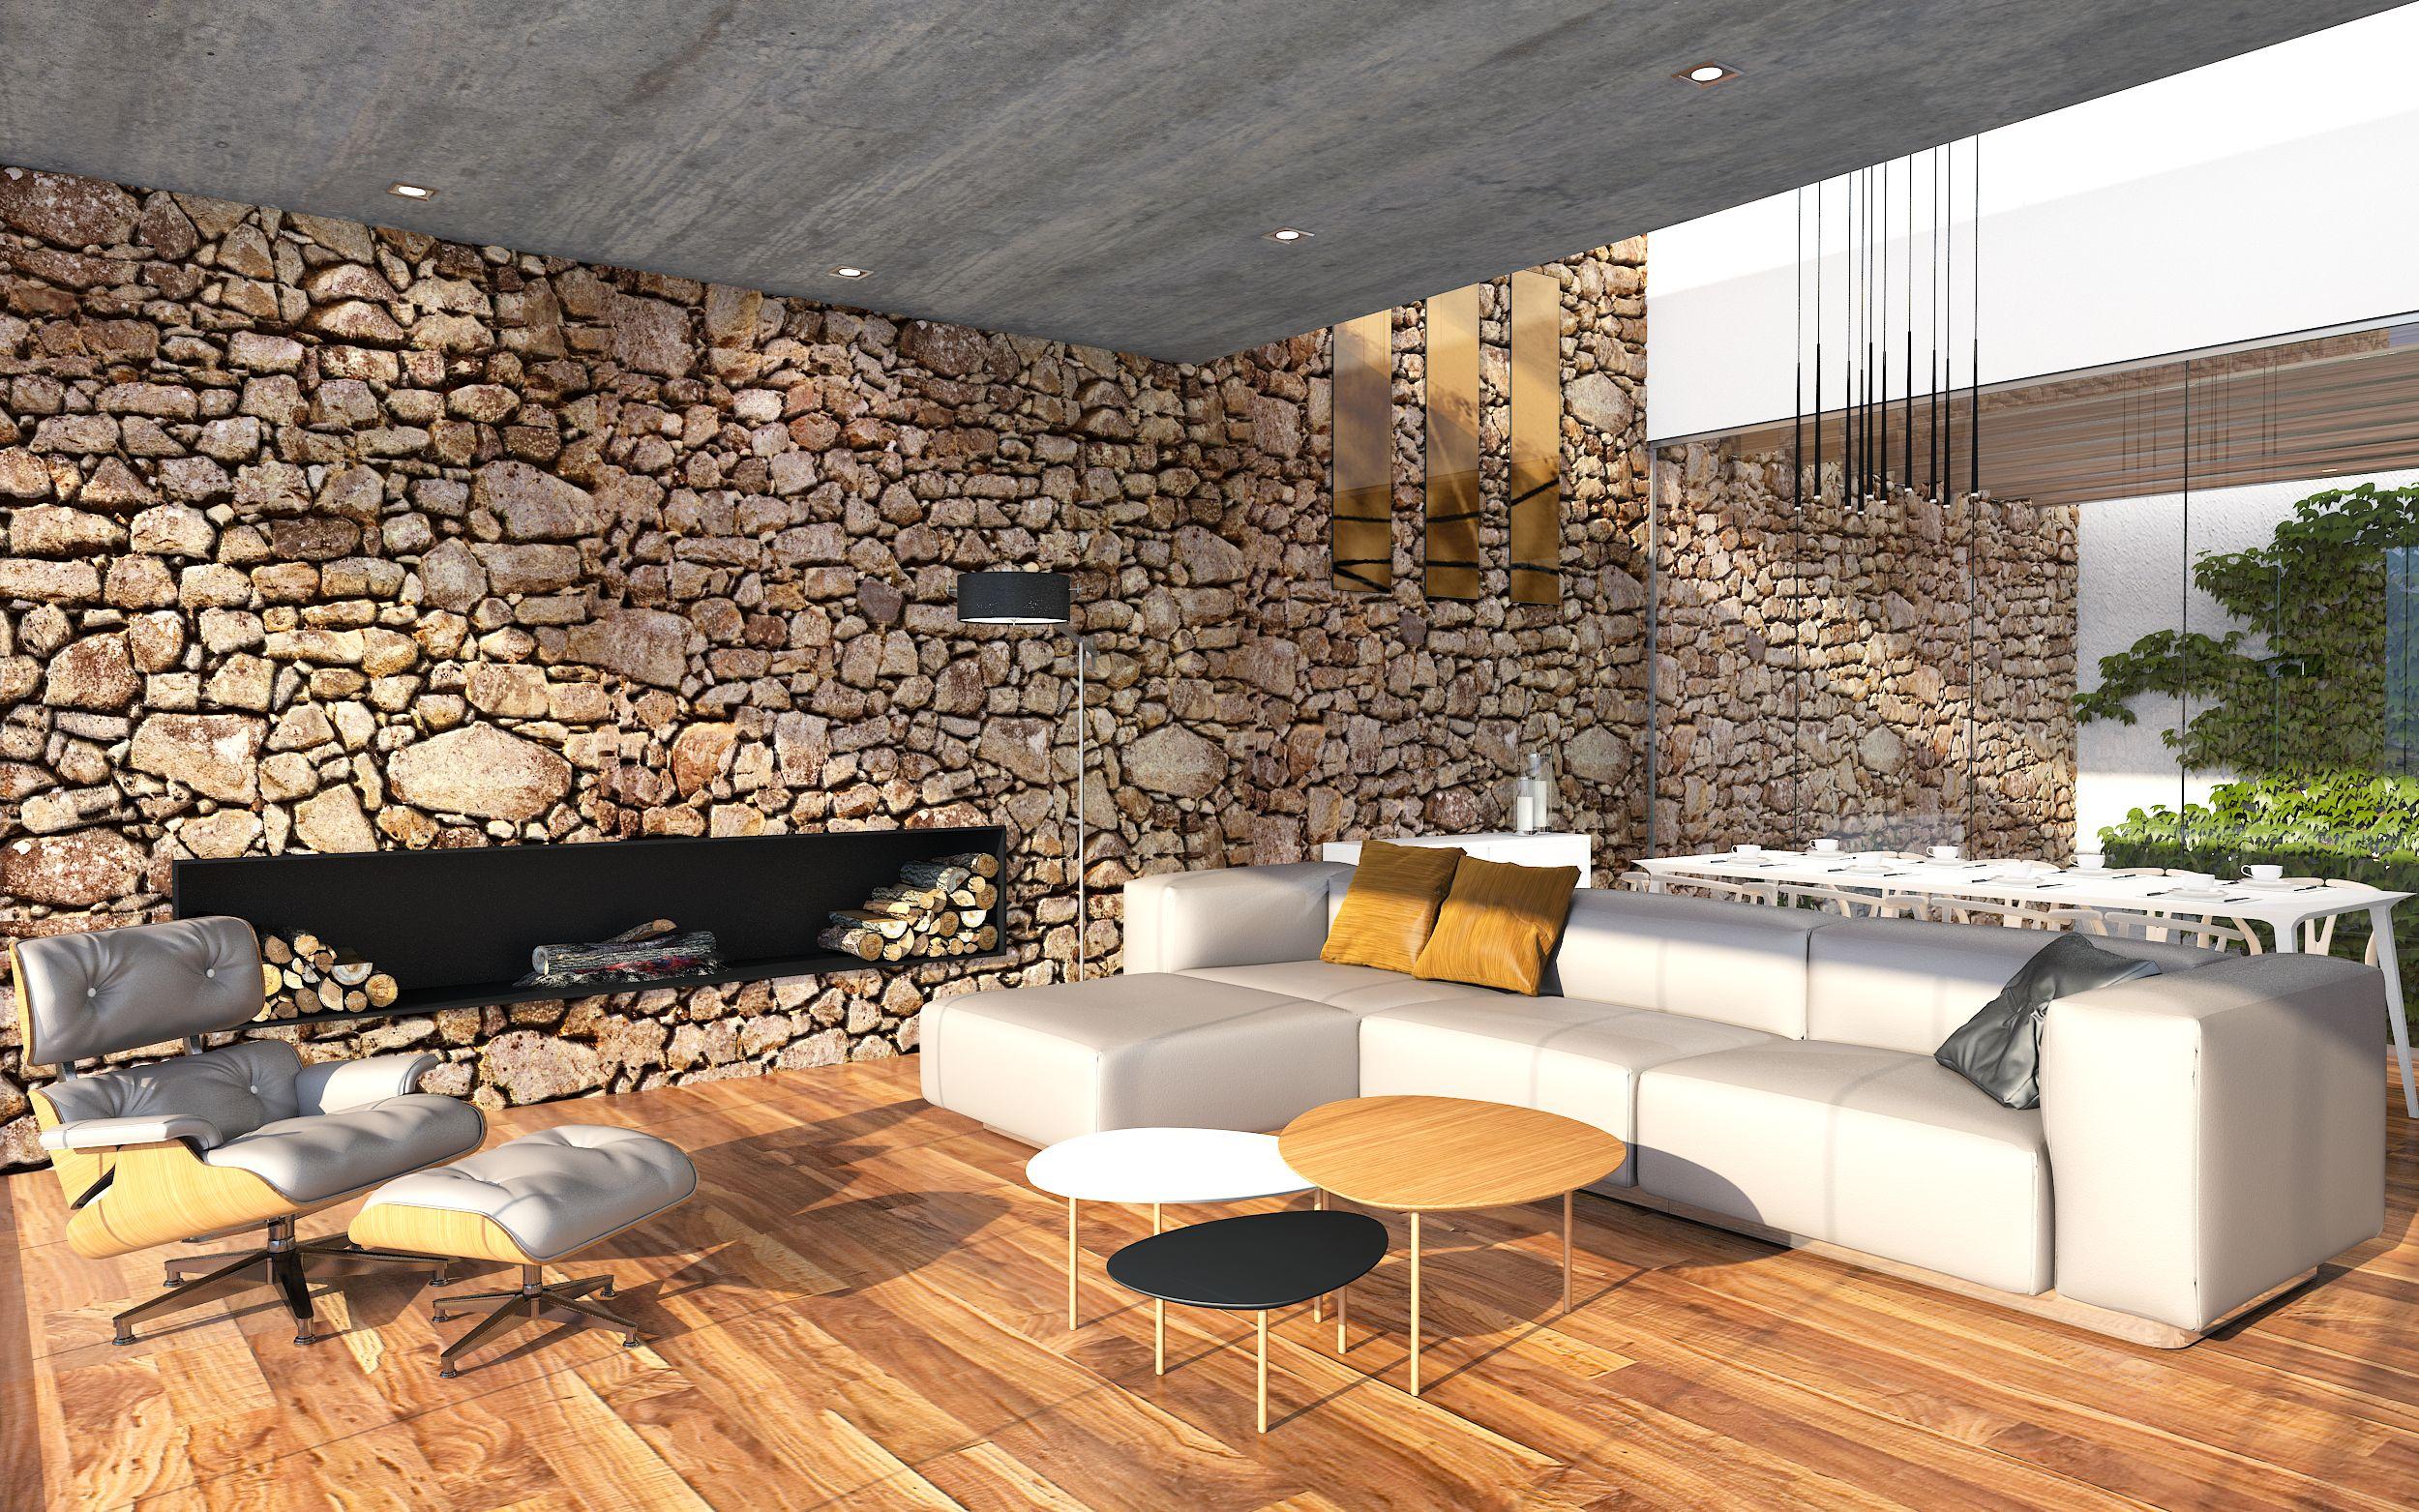 EZAR-Arquitectura-Diseño-DOM3-PRIZE-2016-urbania_international-marbella-ARCADIA_08